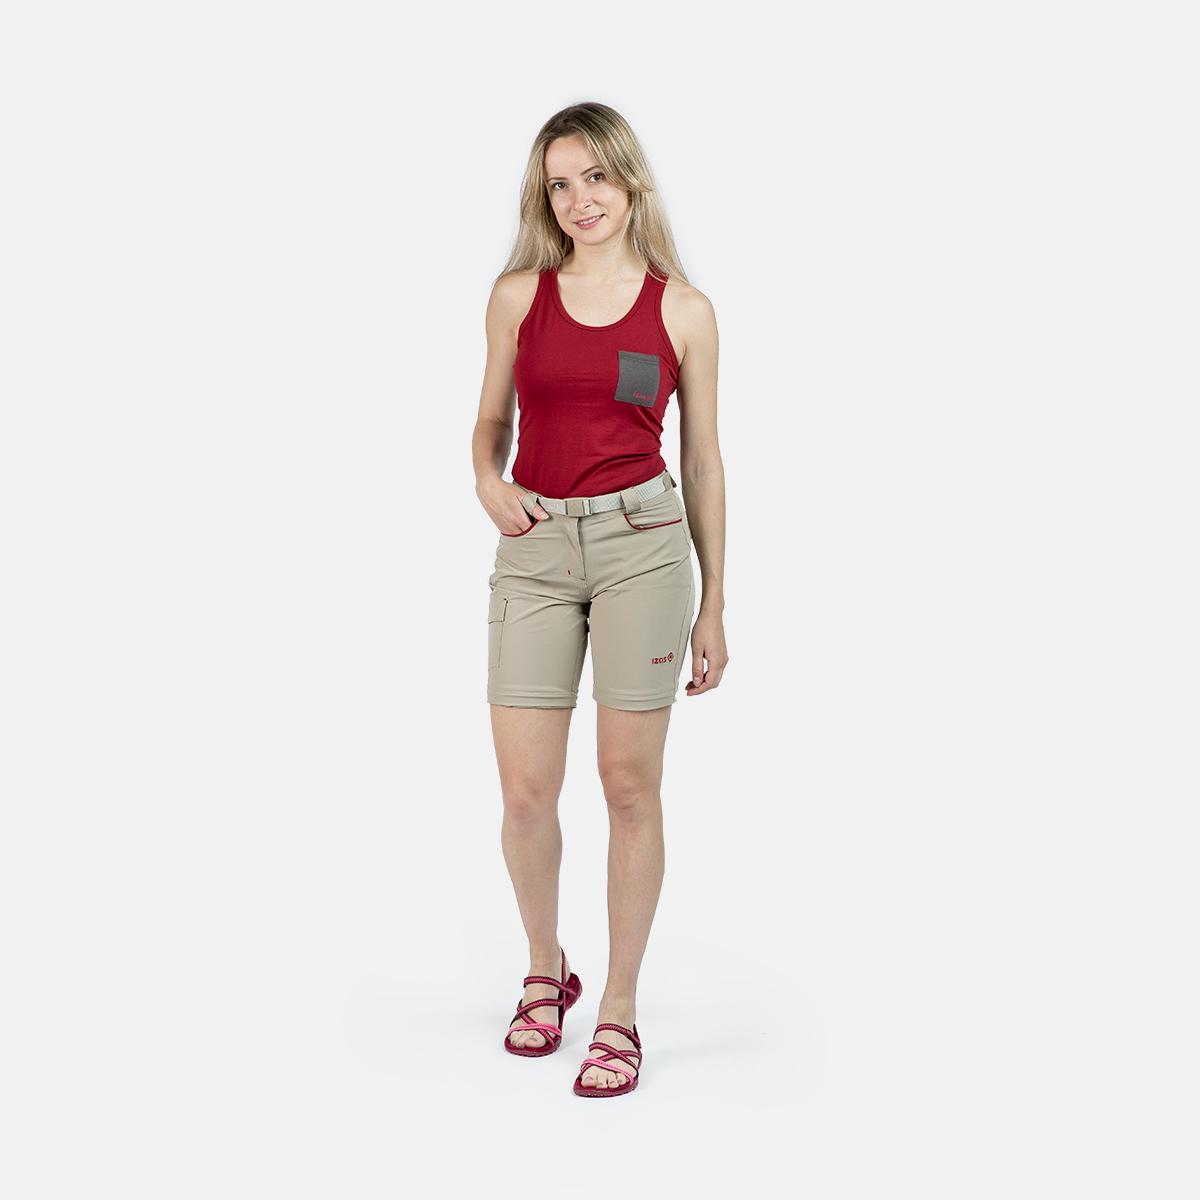 WOMAN TREKKING PANTS MAUNA II GREY/RED